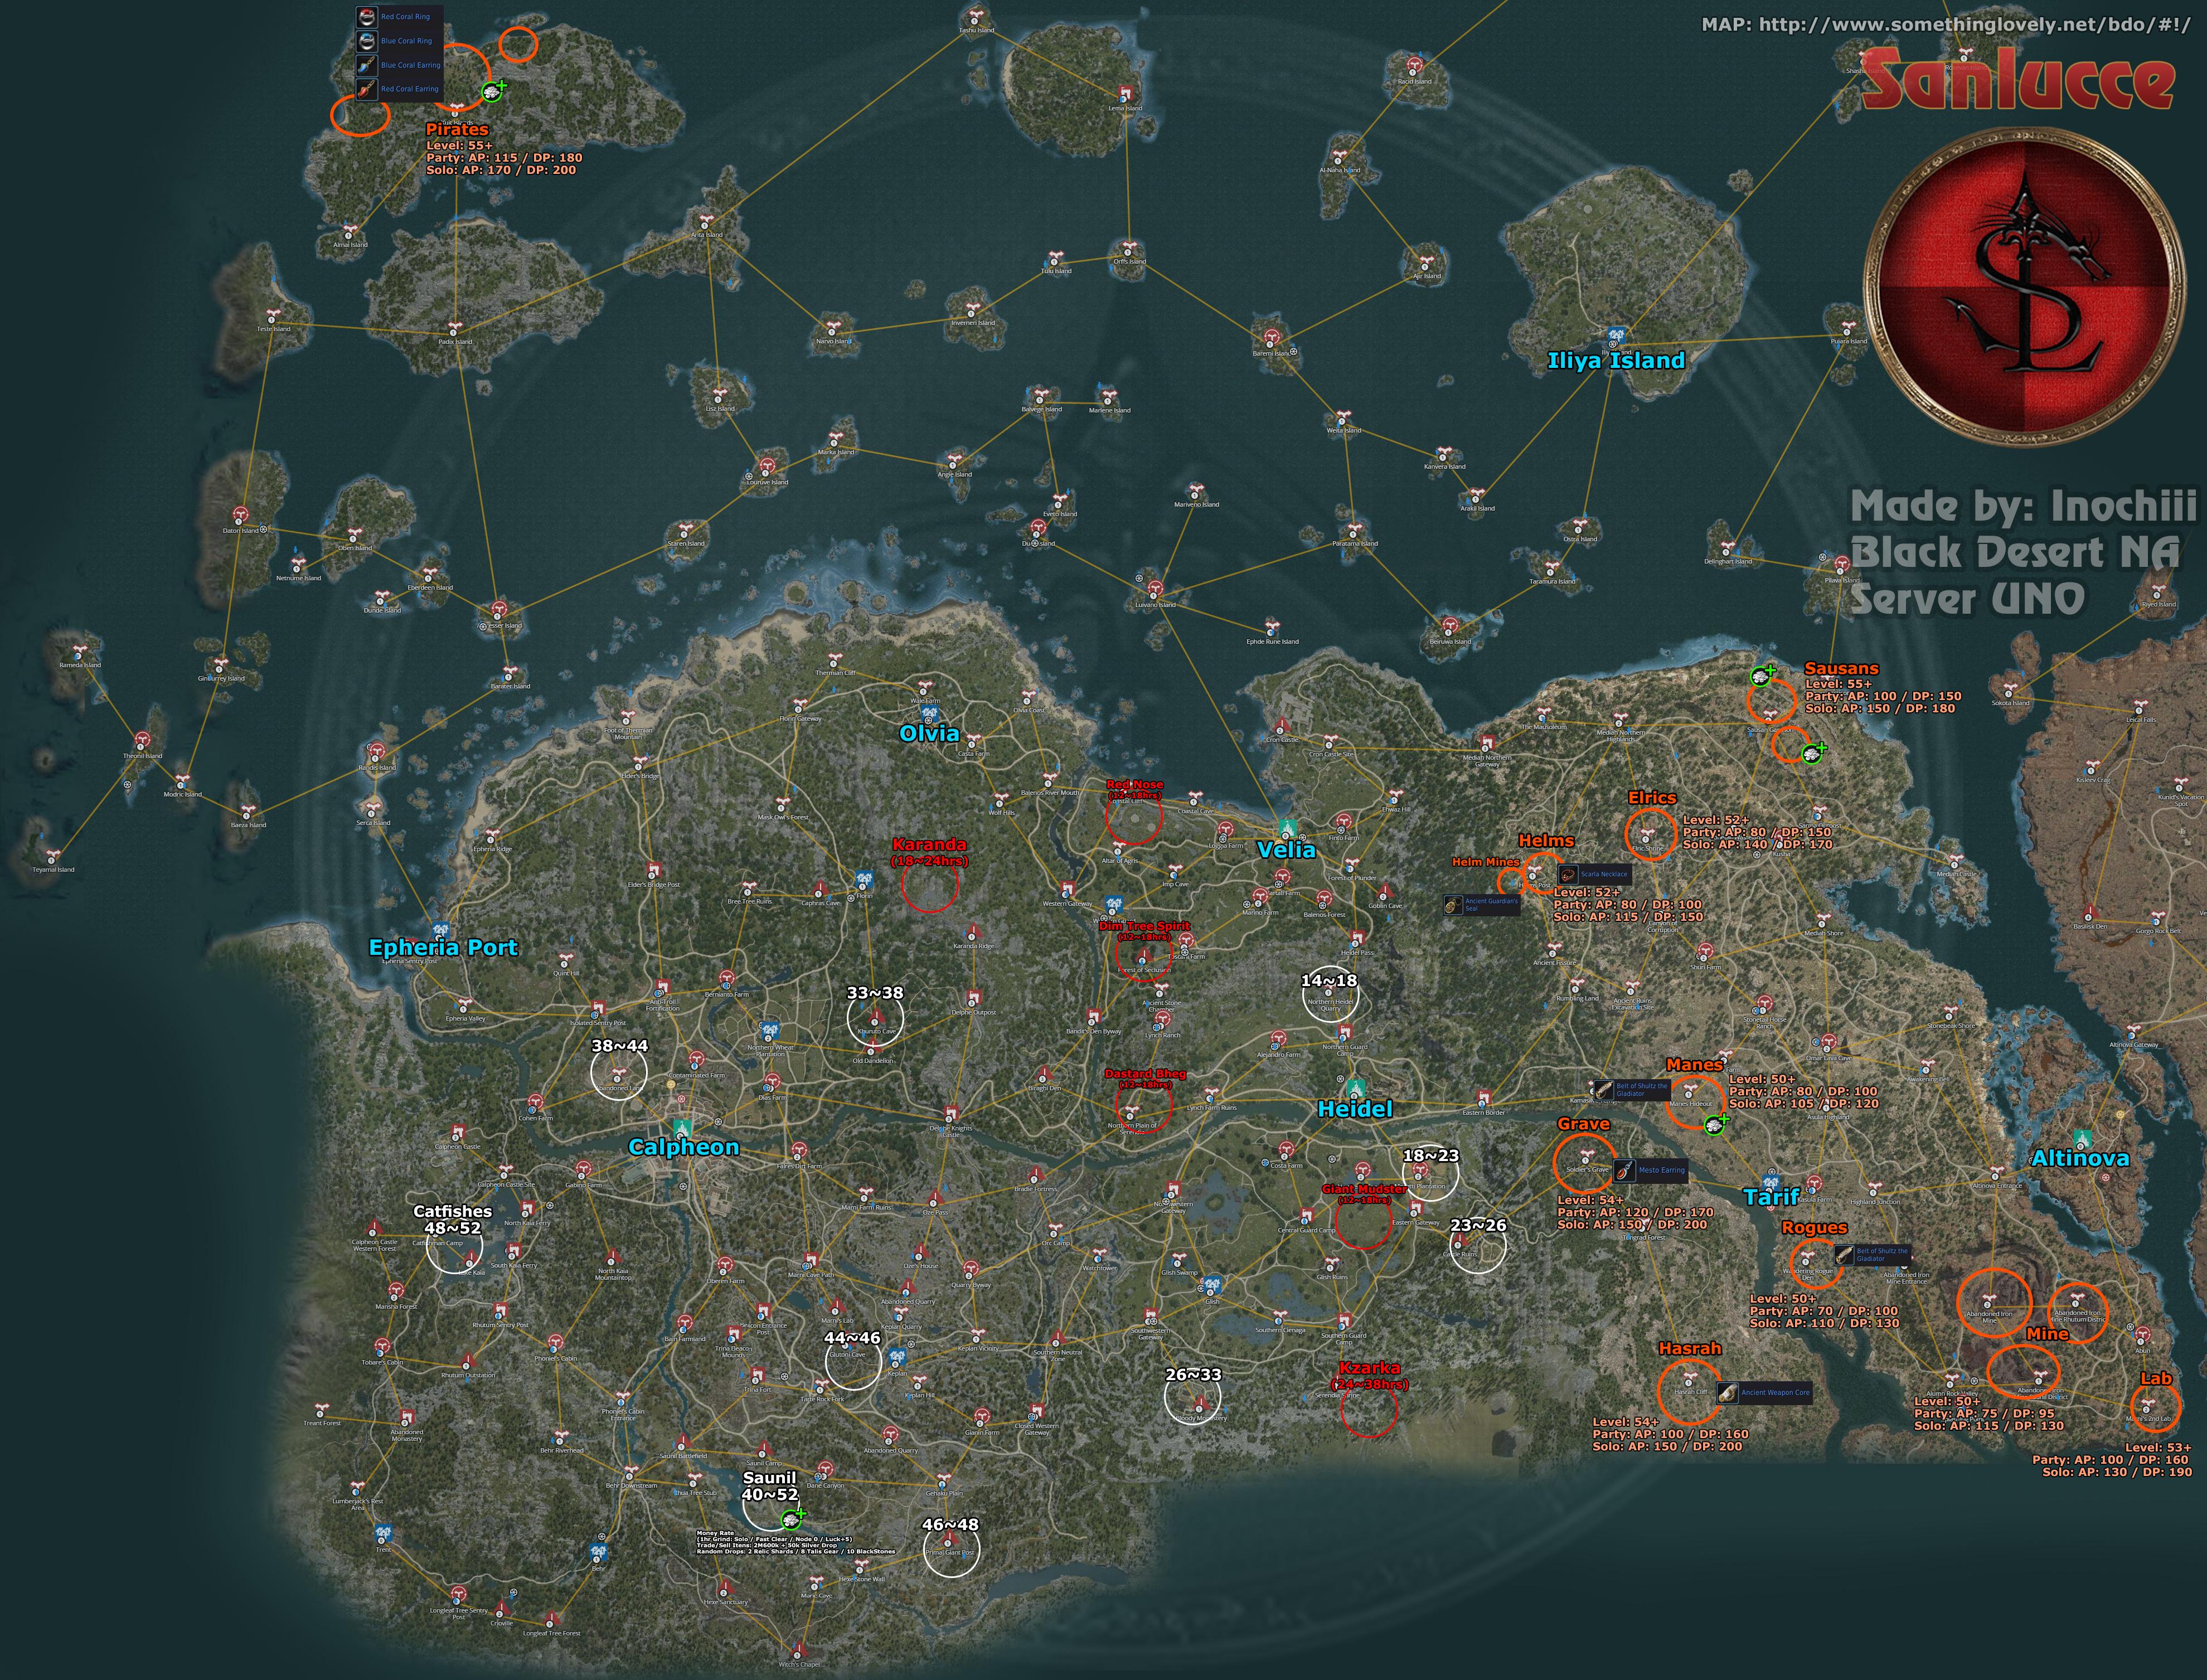 bdo karte 23/09) Grind and Leveling MAP GUIDE   Guides   The Black Desert Online